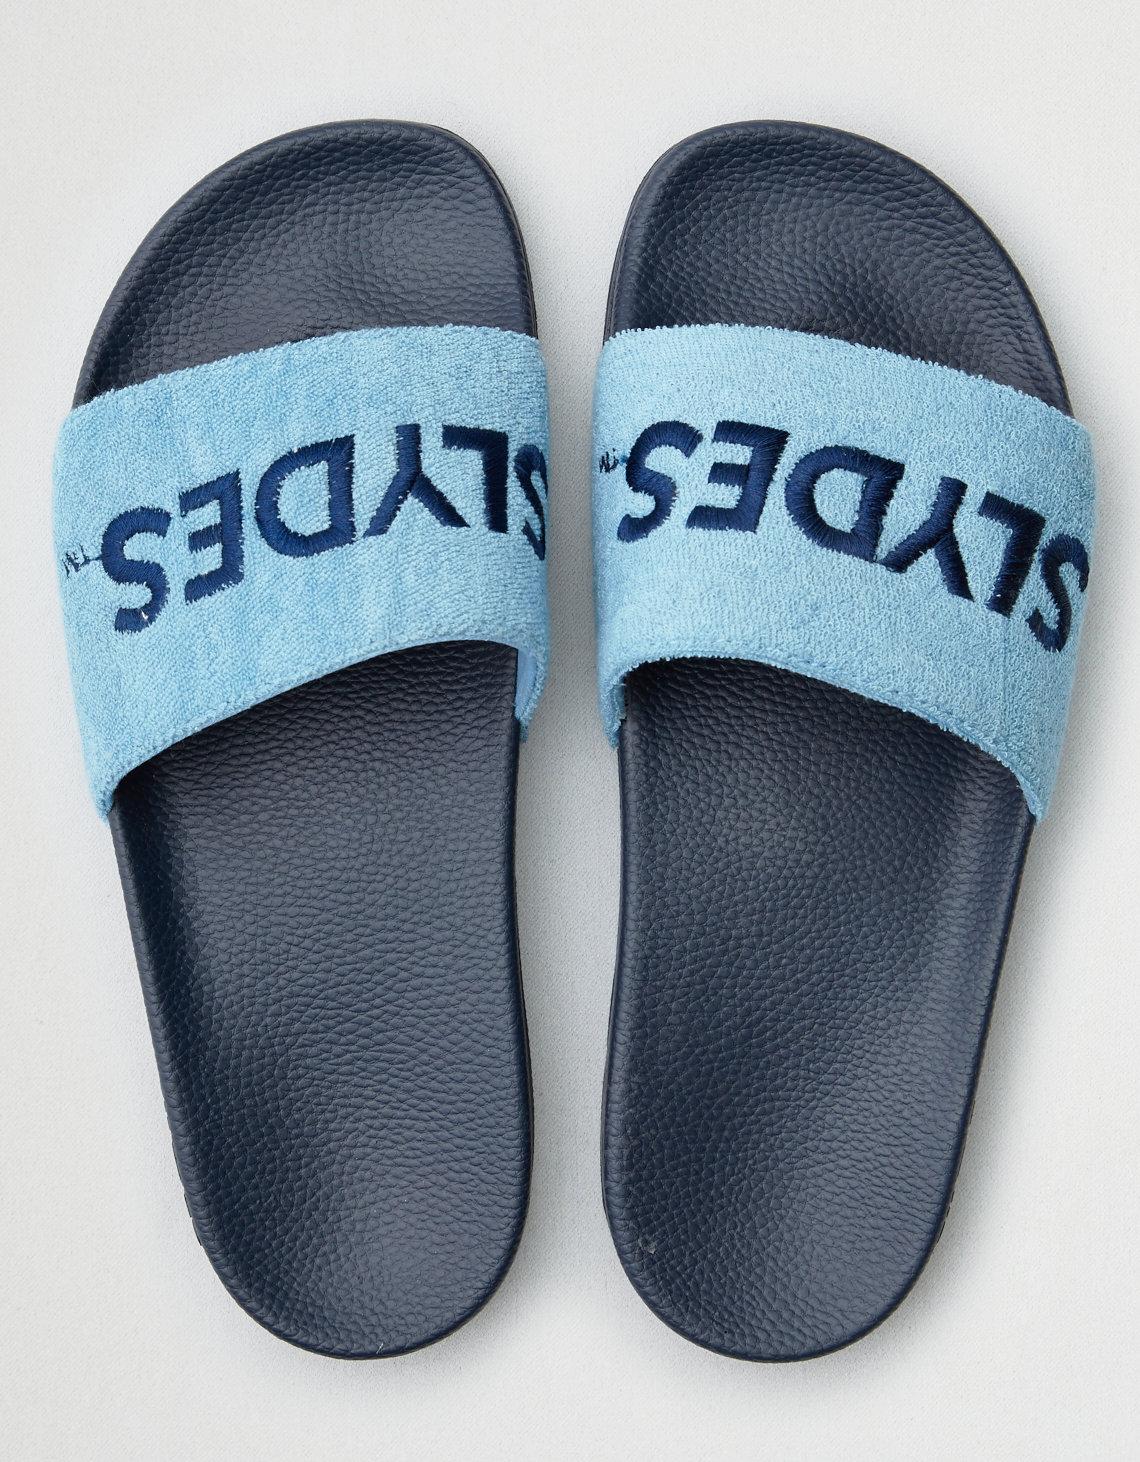 online sale online Slydes™ Carter Khaki Slider Sandals cheap sale for sale NbmNMSIkPl